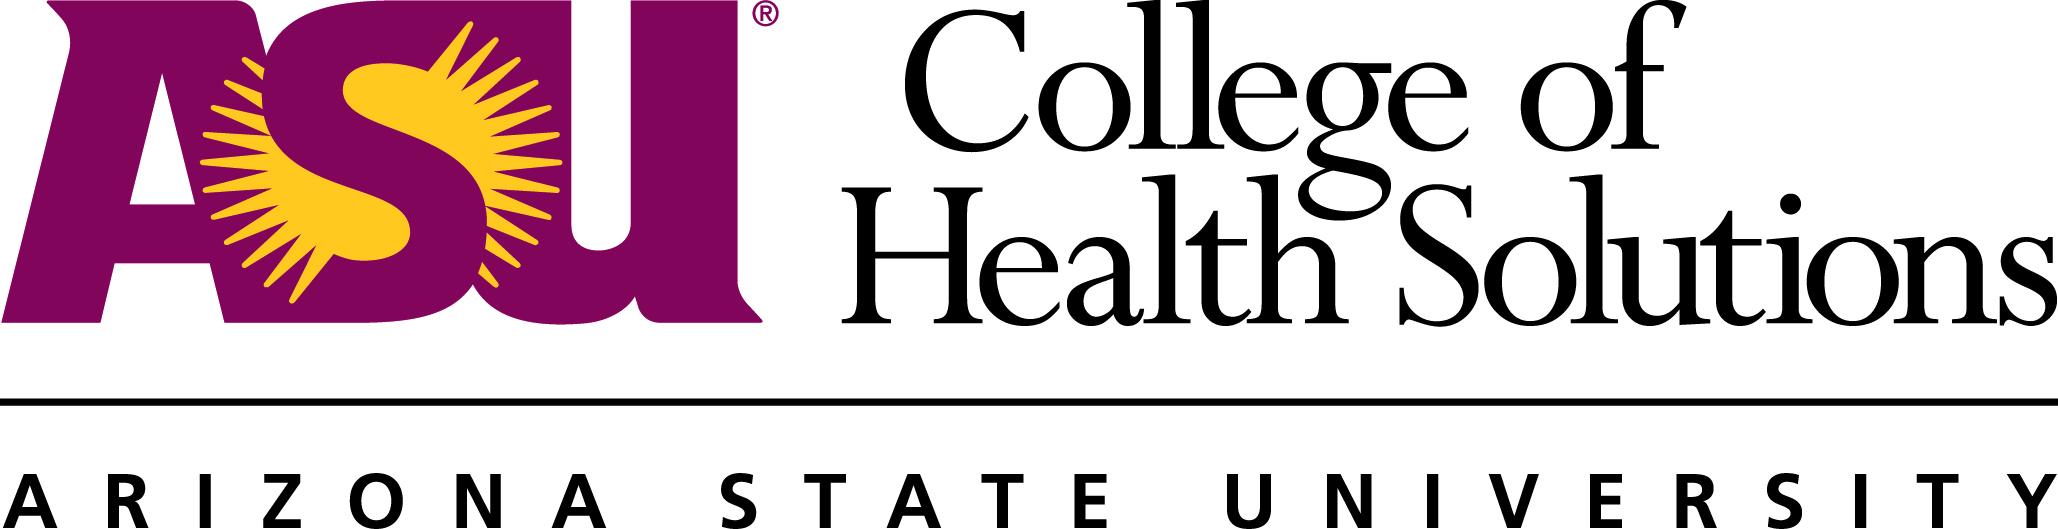 arizona state university nursing partners with scottsdale texas tech logos clip art texas tech logo svg